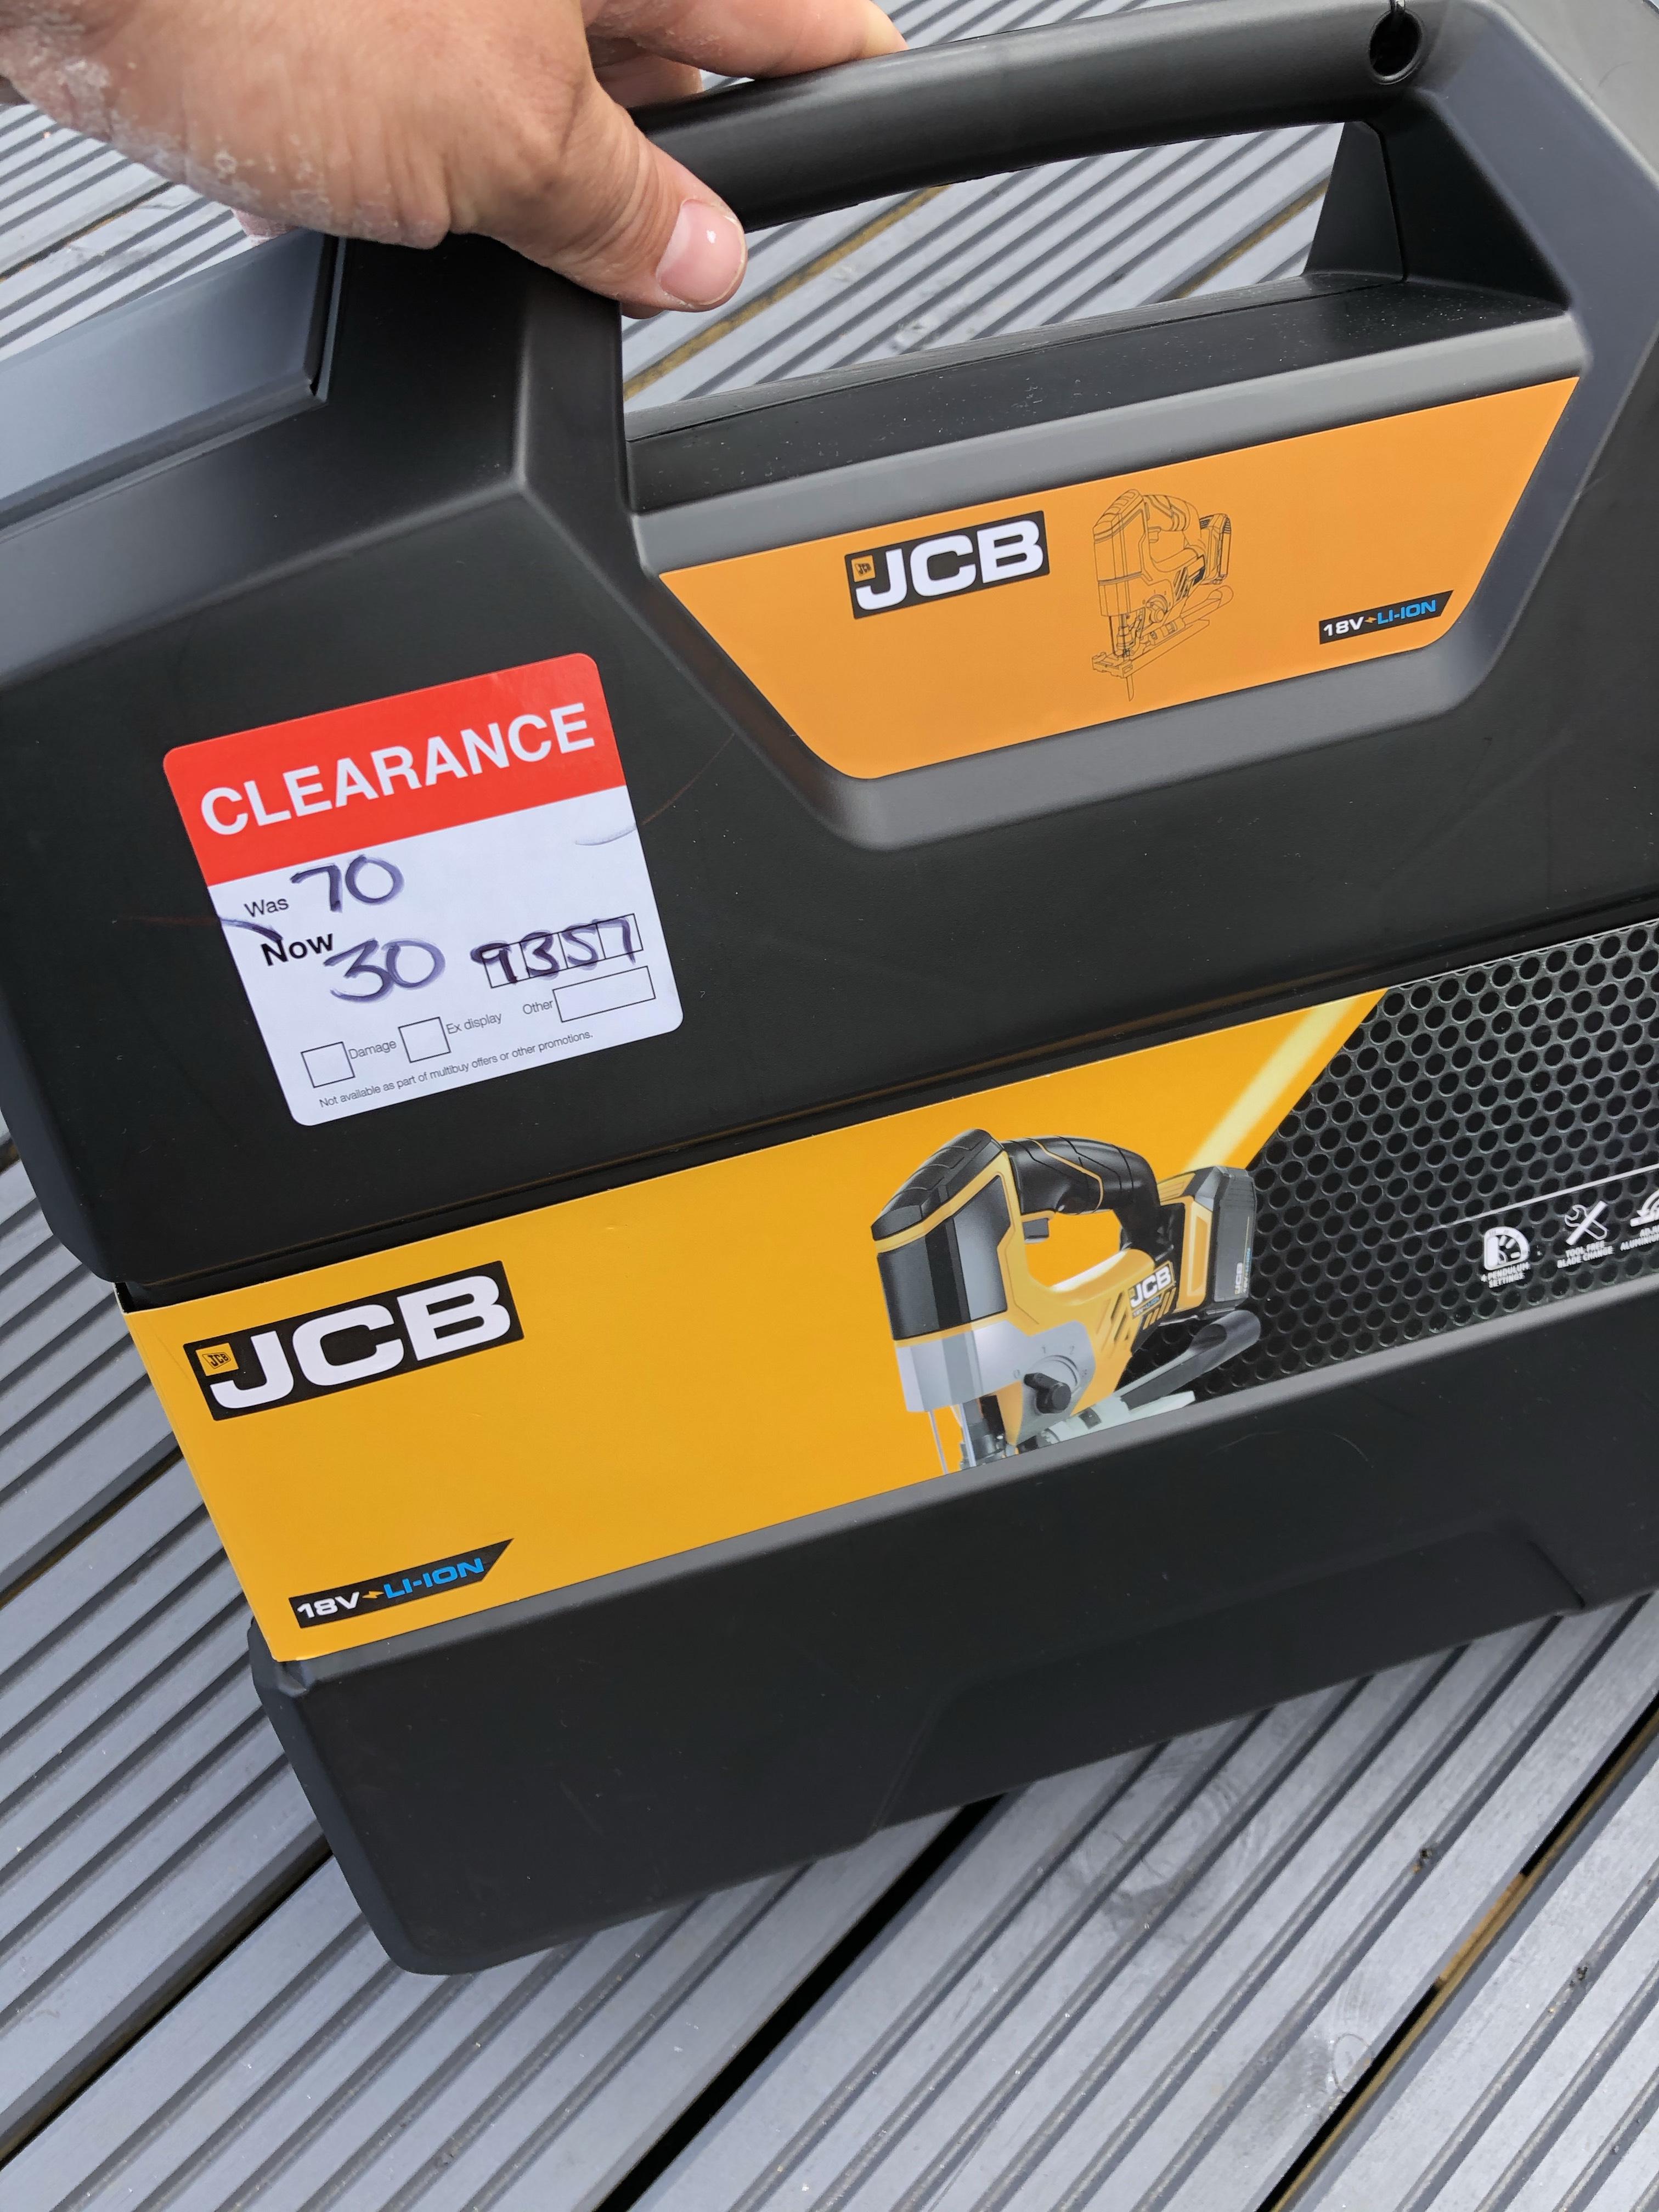 JCB 5Ah 18V Cordless Jigsaw 1 battery JCB-18JS-5 - £30 Instore @ B&Q (Halesowen)